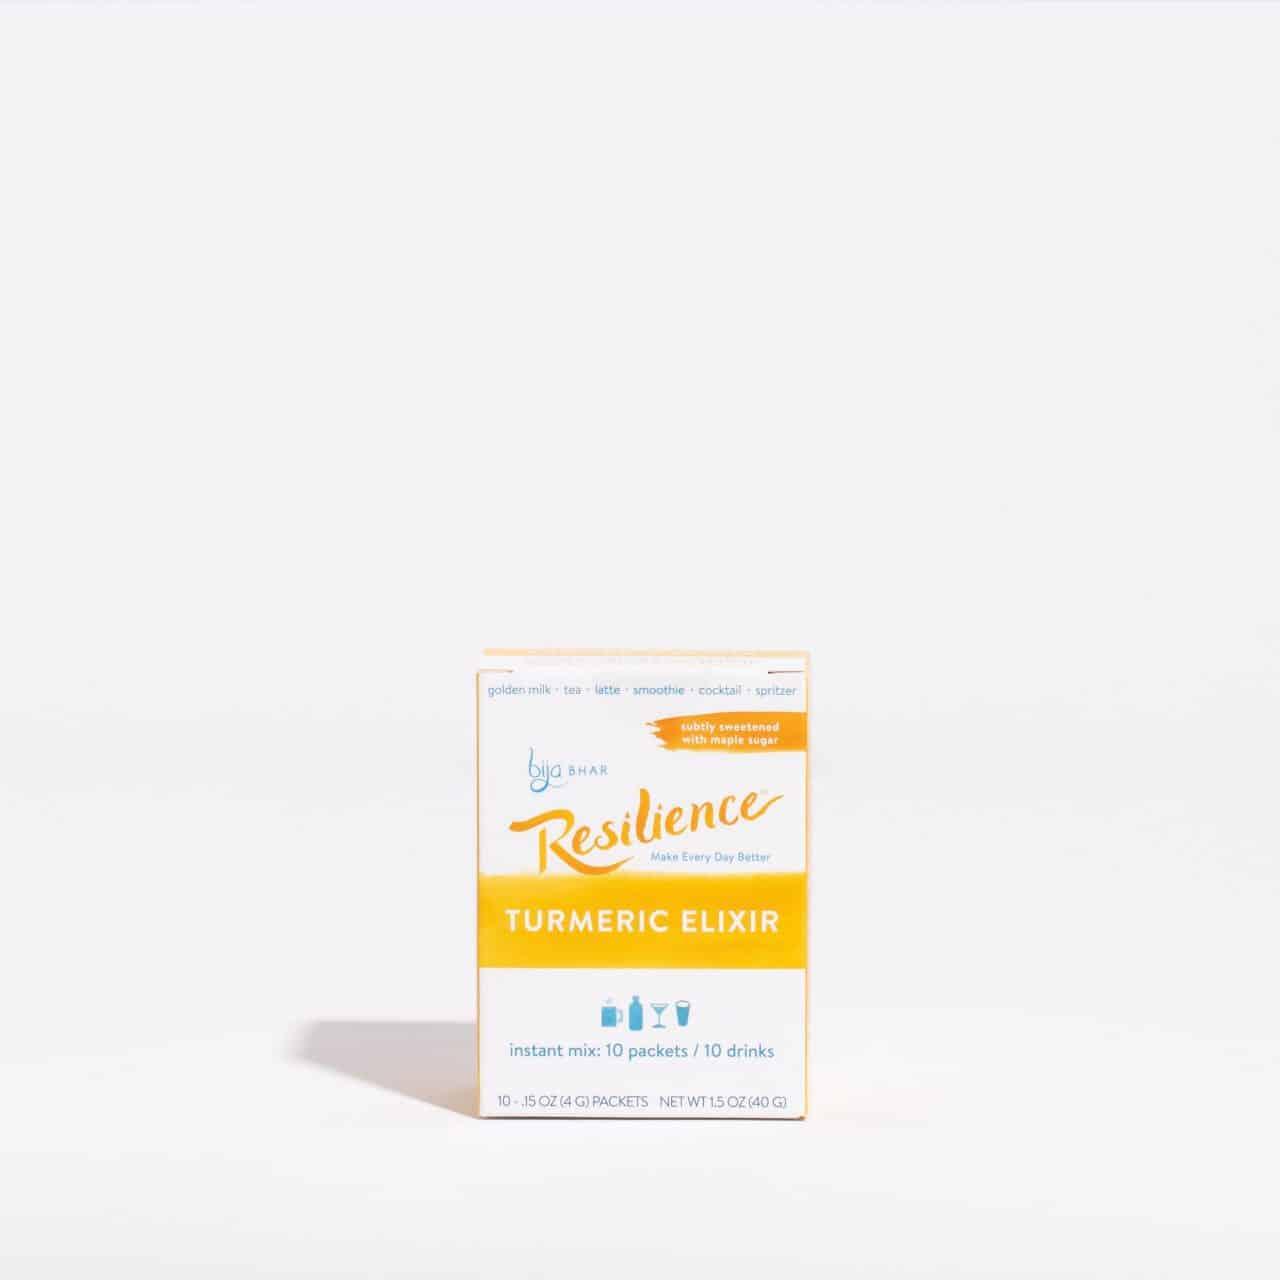 Resilience Turmeric Elixir Box of 10 sachets